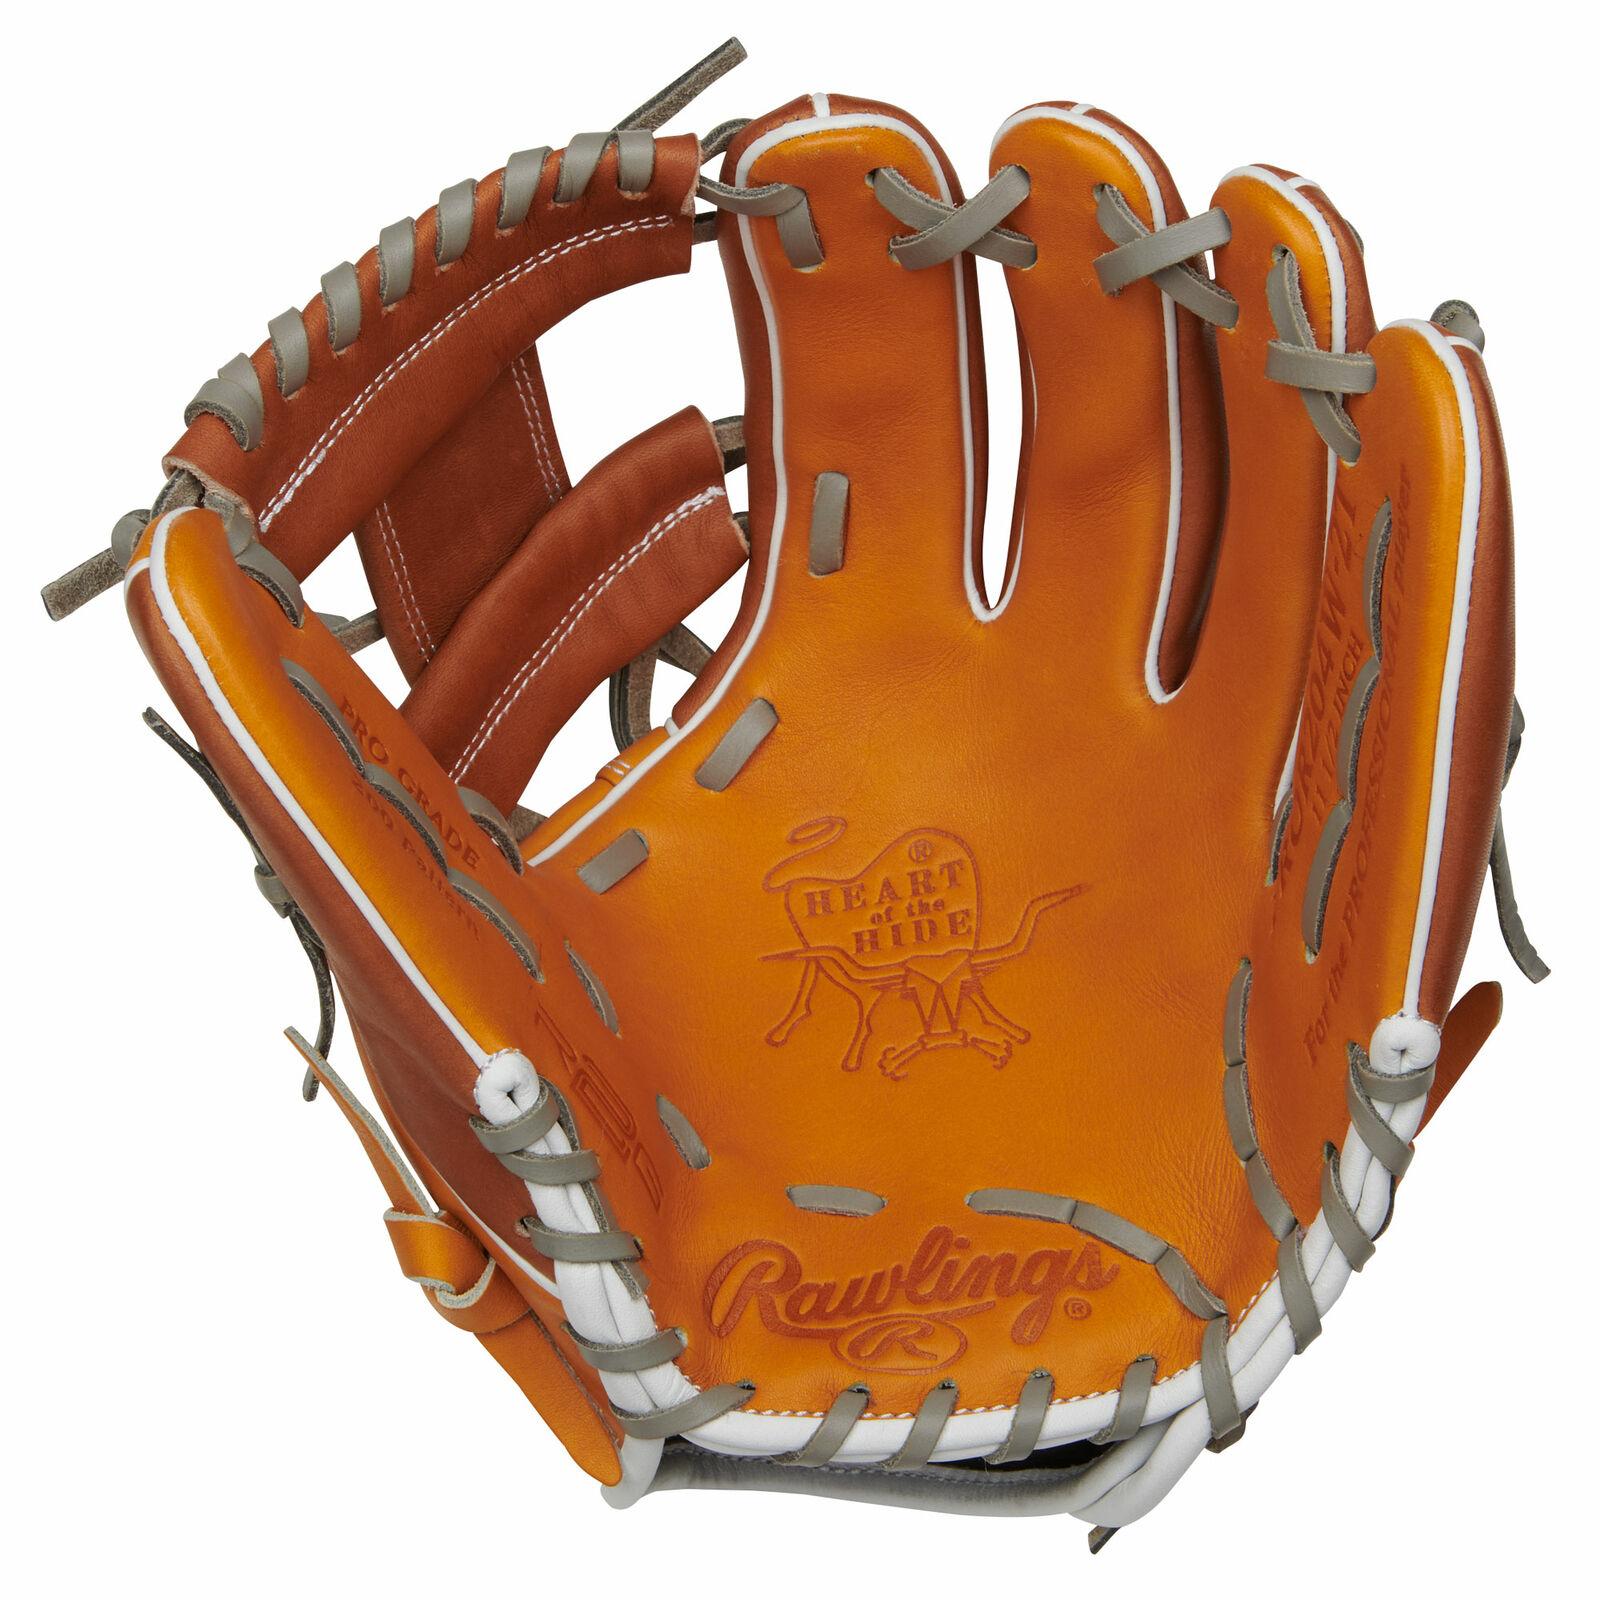 Rawlings Pror 204W-2T Heart of the hide serie R2G 11.5 pulgadas Guante de béisbol Derecho